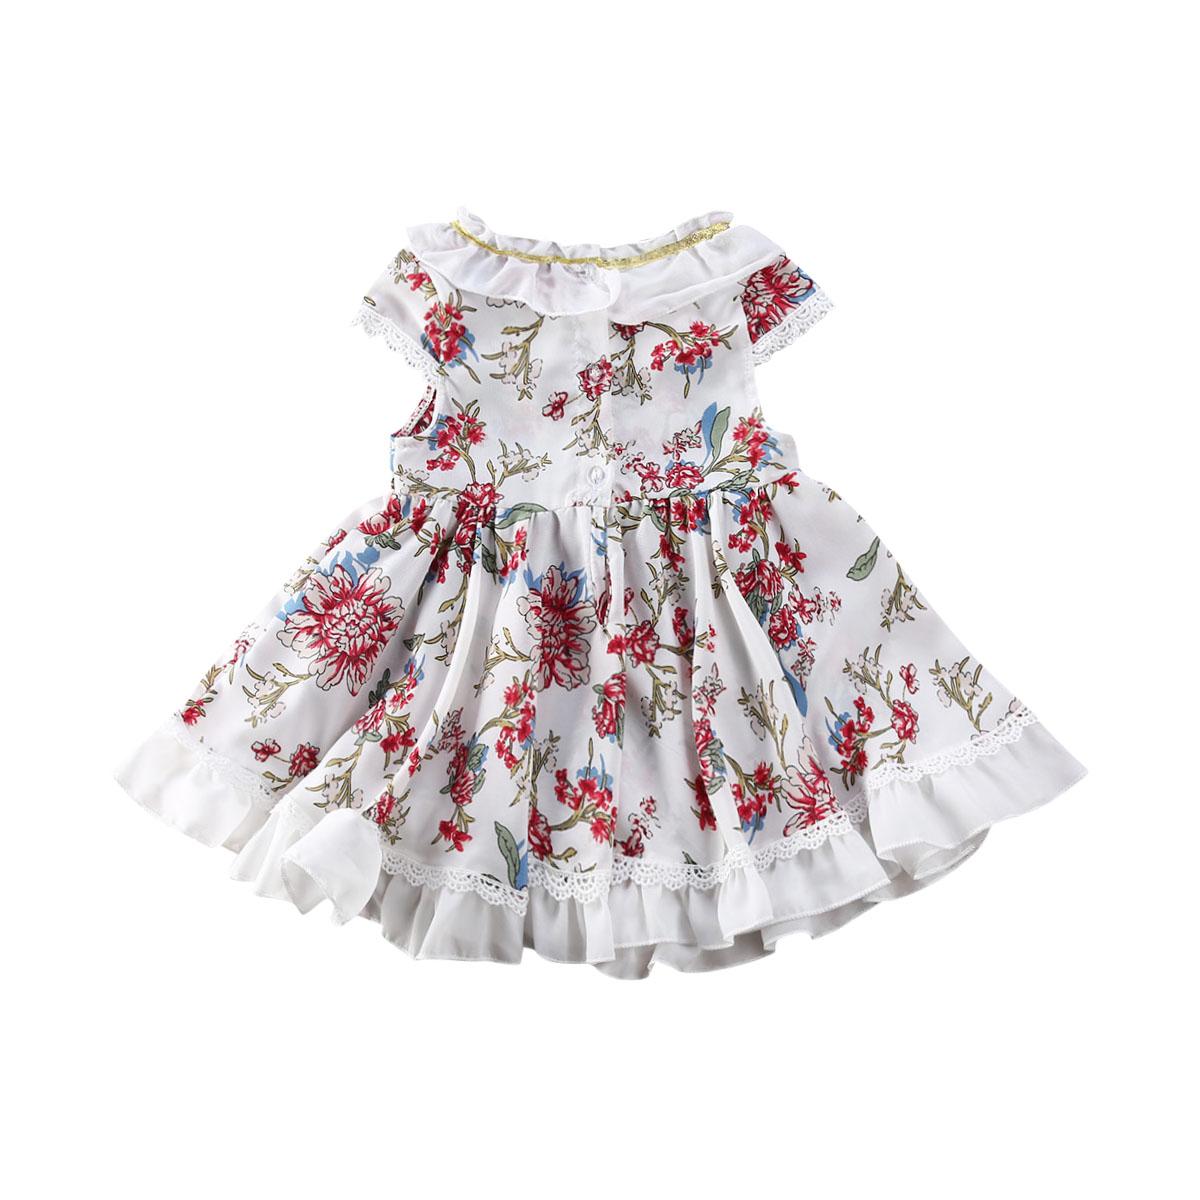 Baby Kids Girls Summer Dresses Toddler Infants Beach Sleeveless Princess Clothes